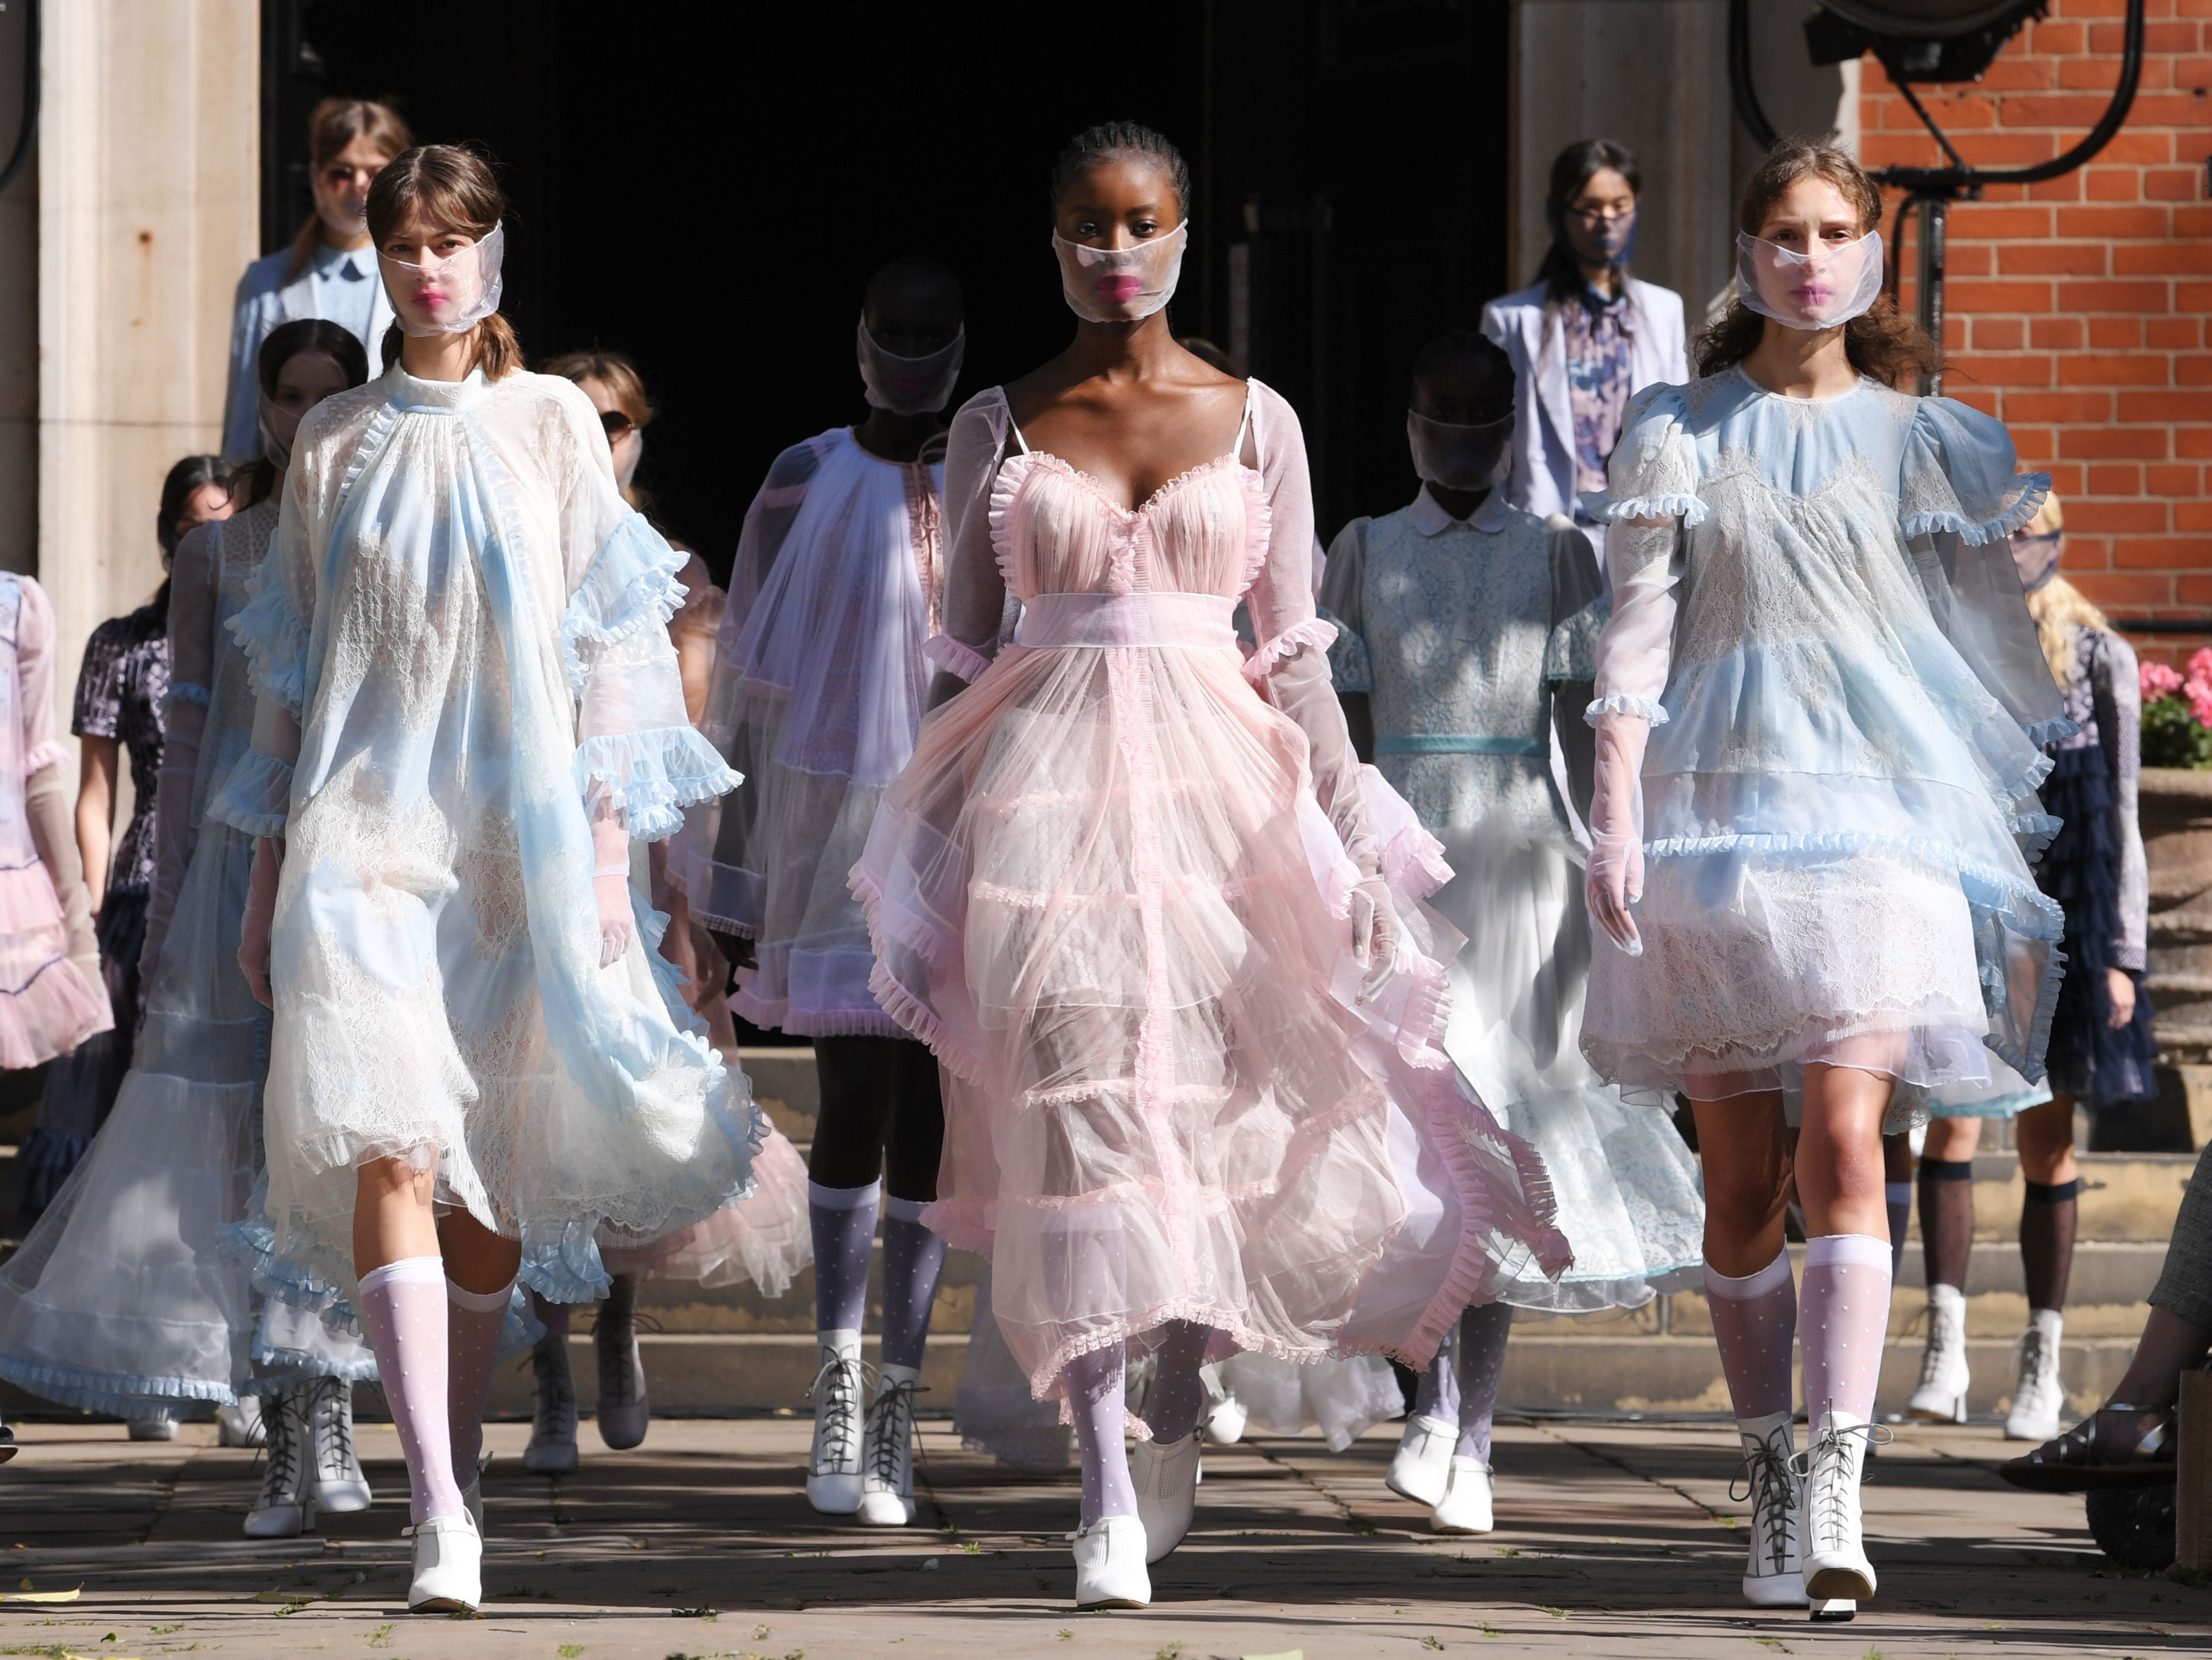 Organza face masks, rave neons and iridescent dresses: Designers embrace escapism as London Fashion Week kicks off